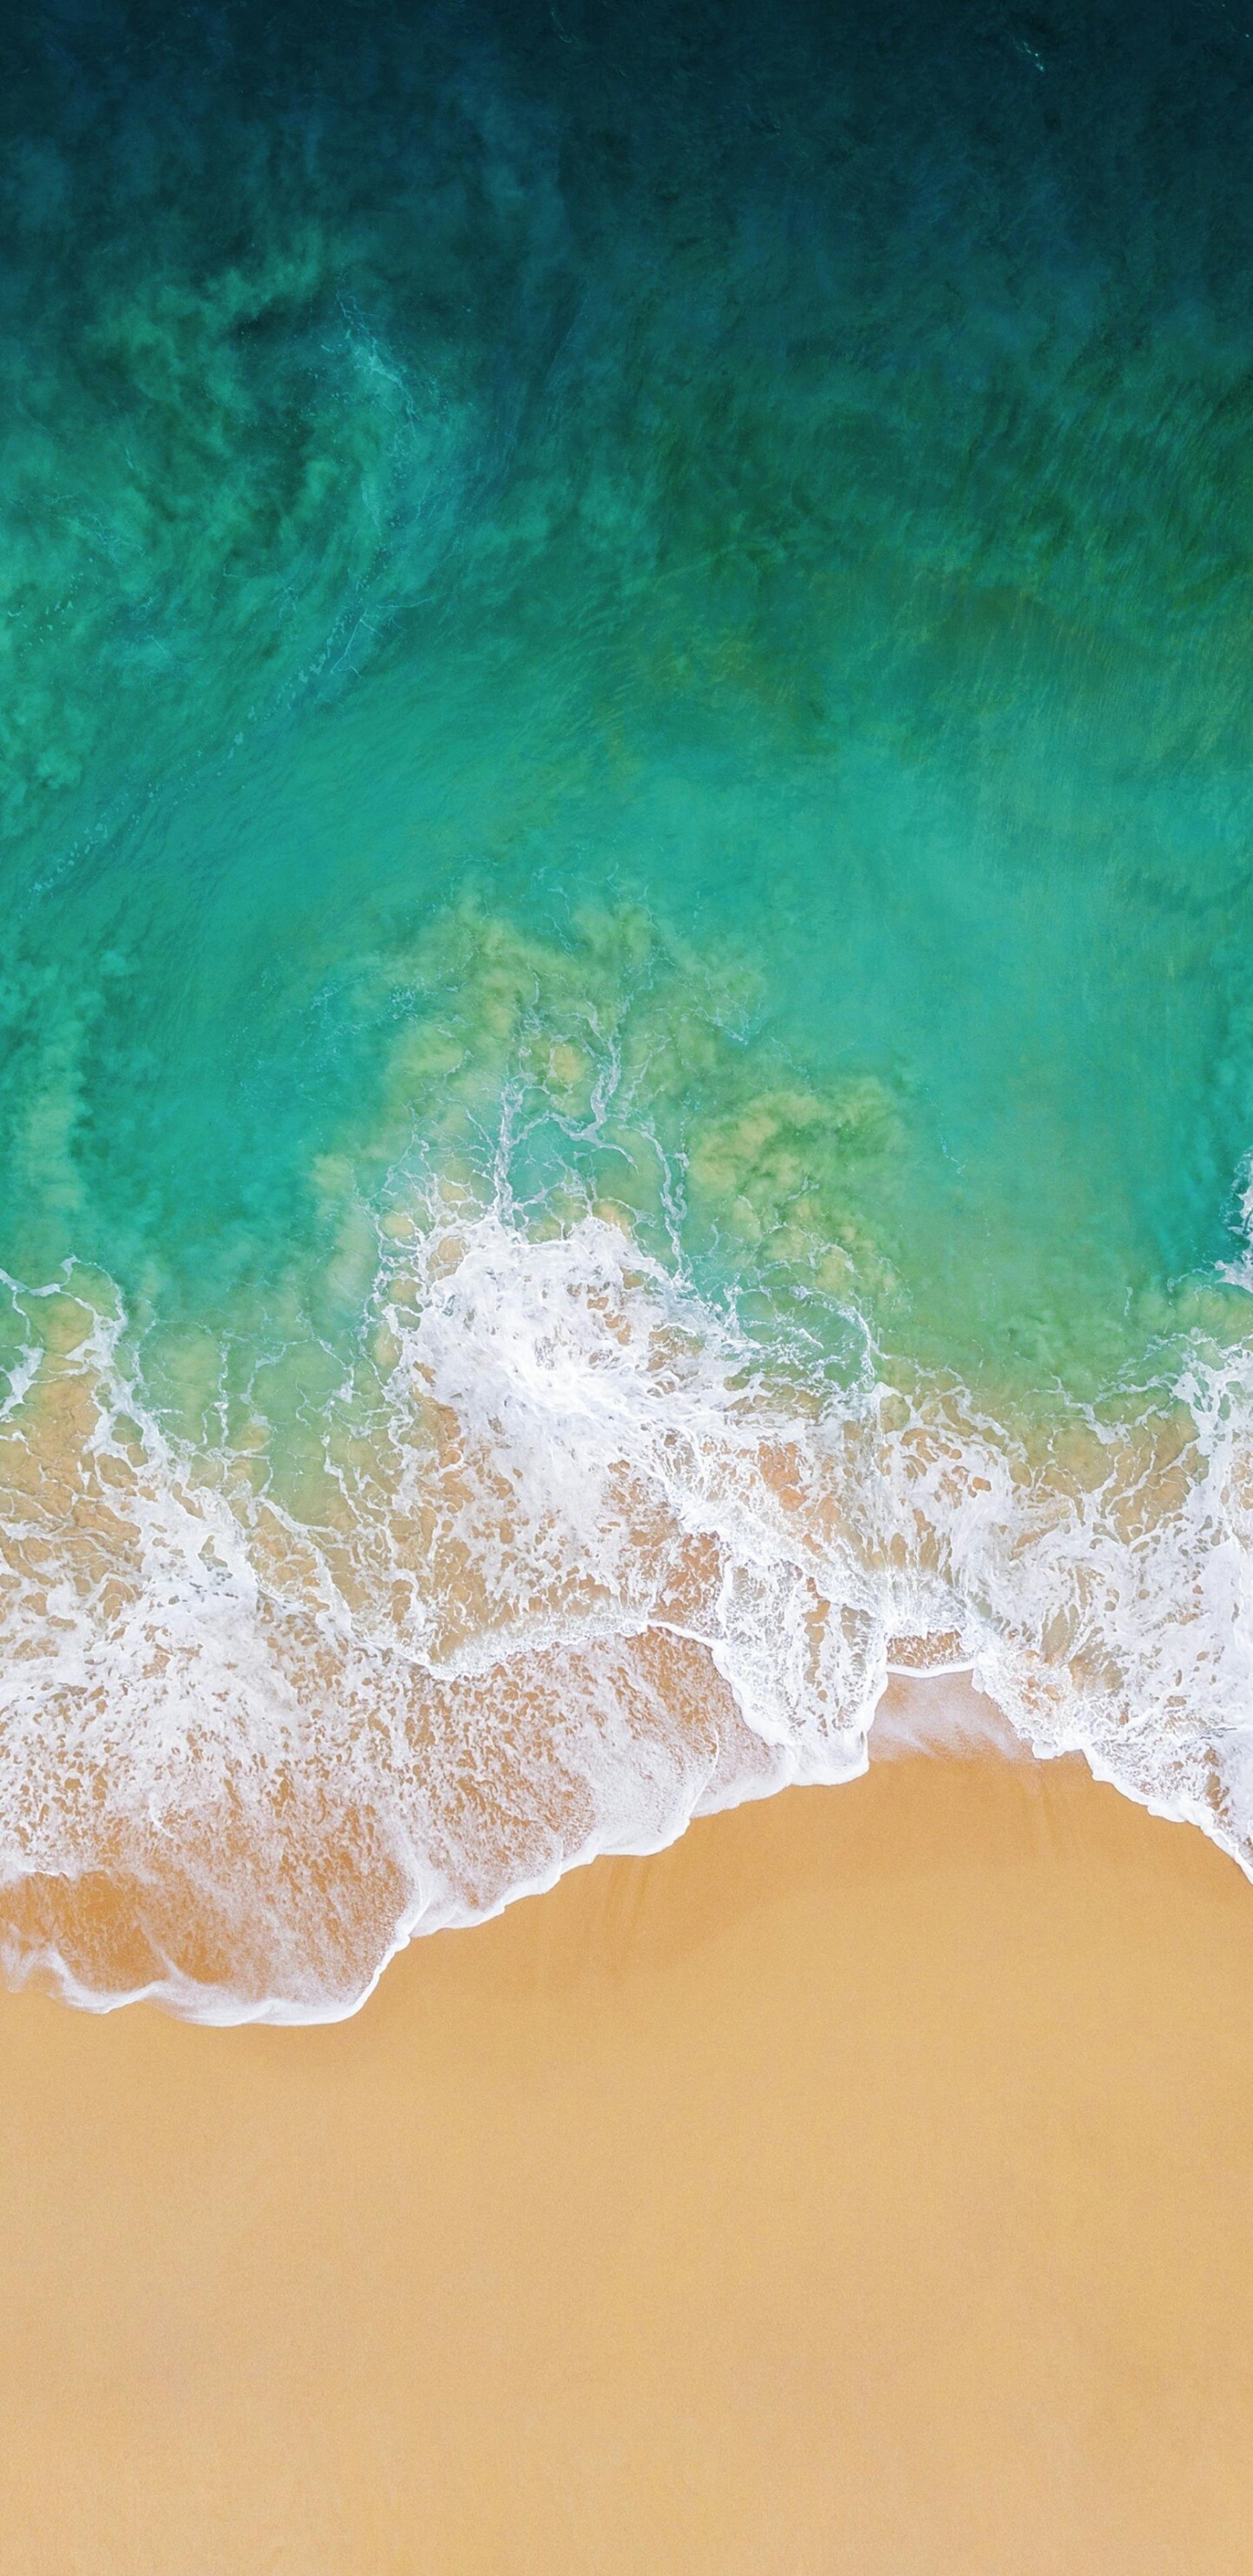 Sea 4k Wallpaper 2 Ios 11 Wallpaper Iphone Wallpaper Ocean